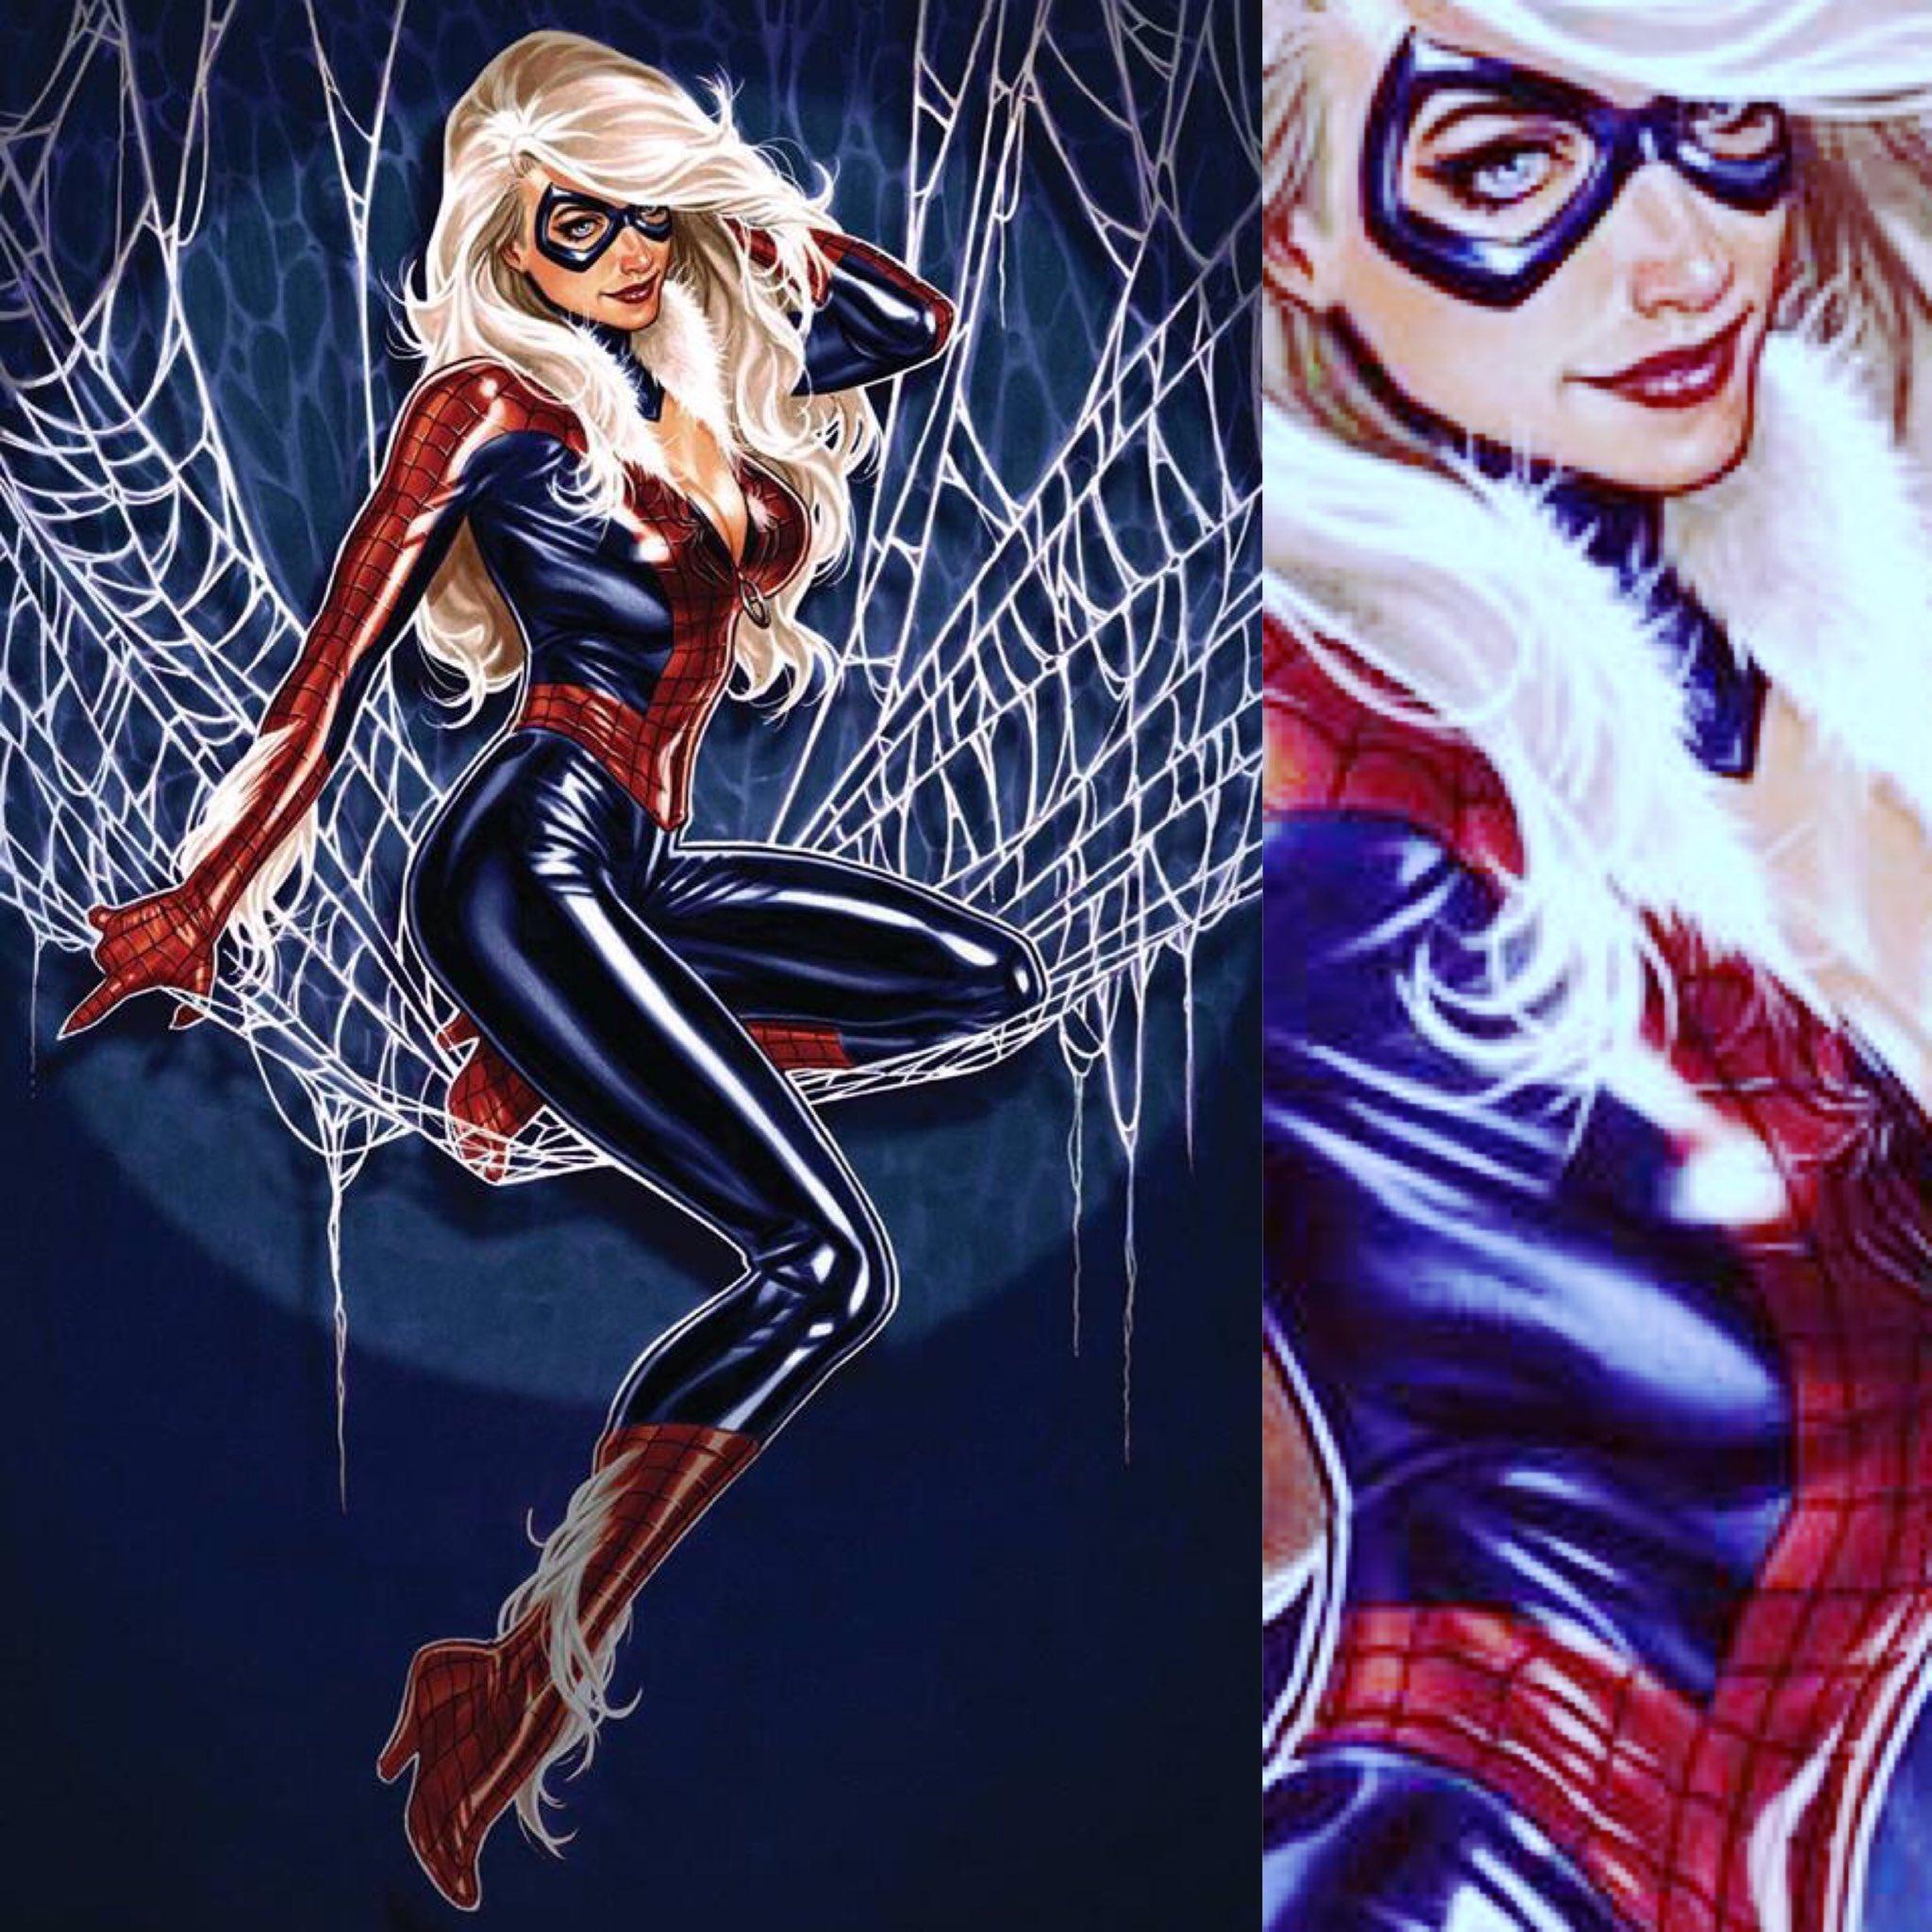 spiderman black cat costume - HD2048×2048